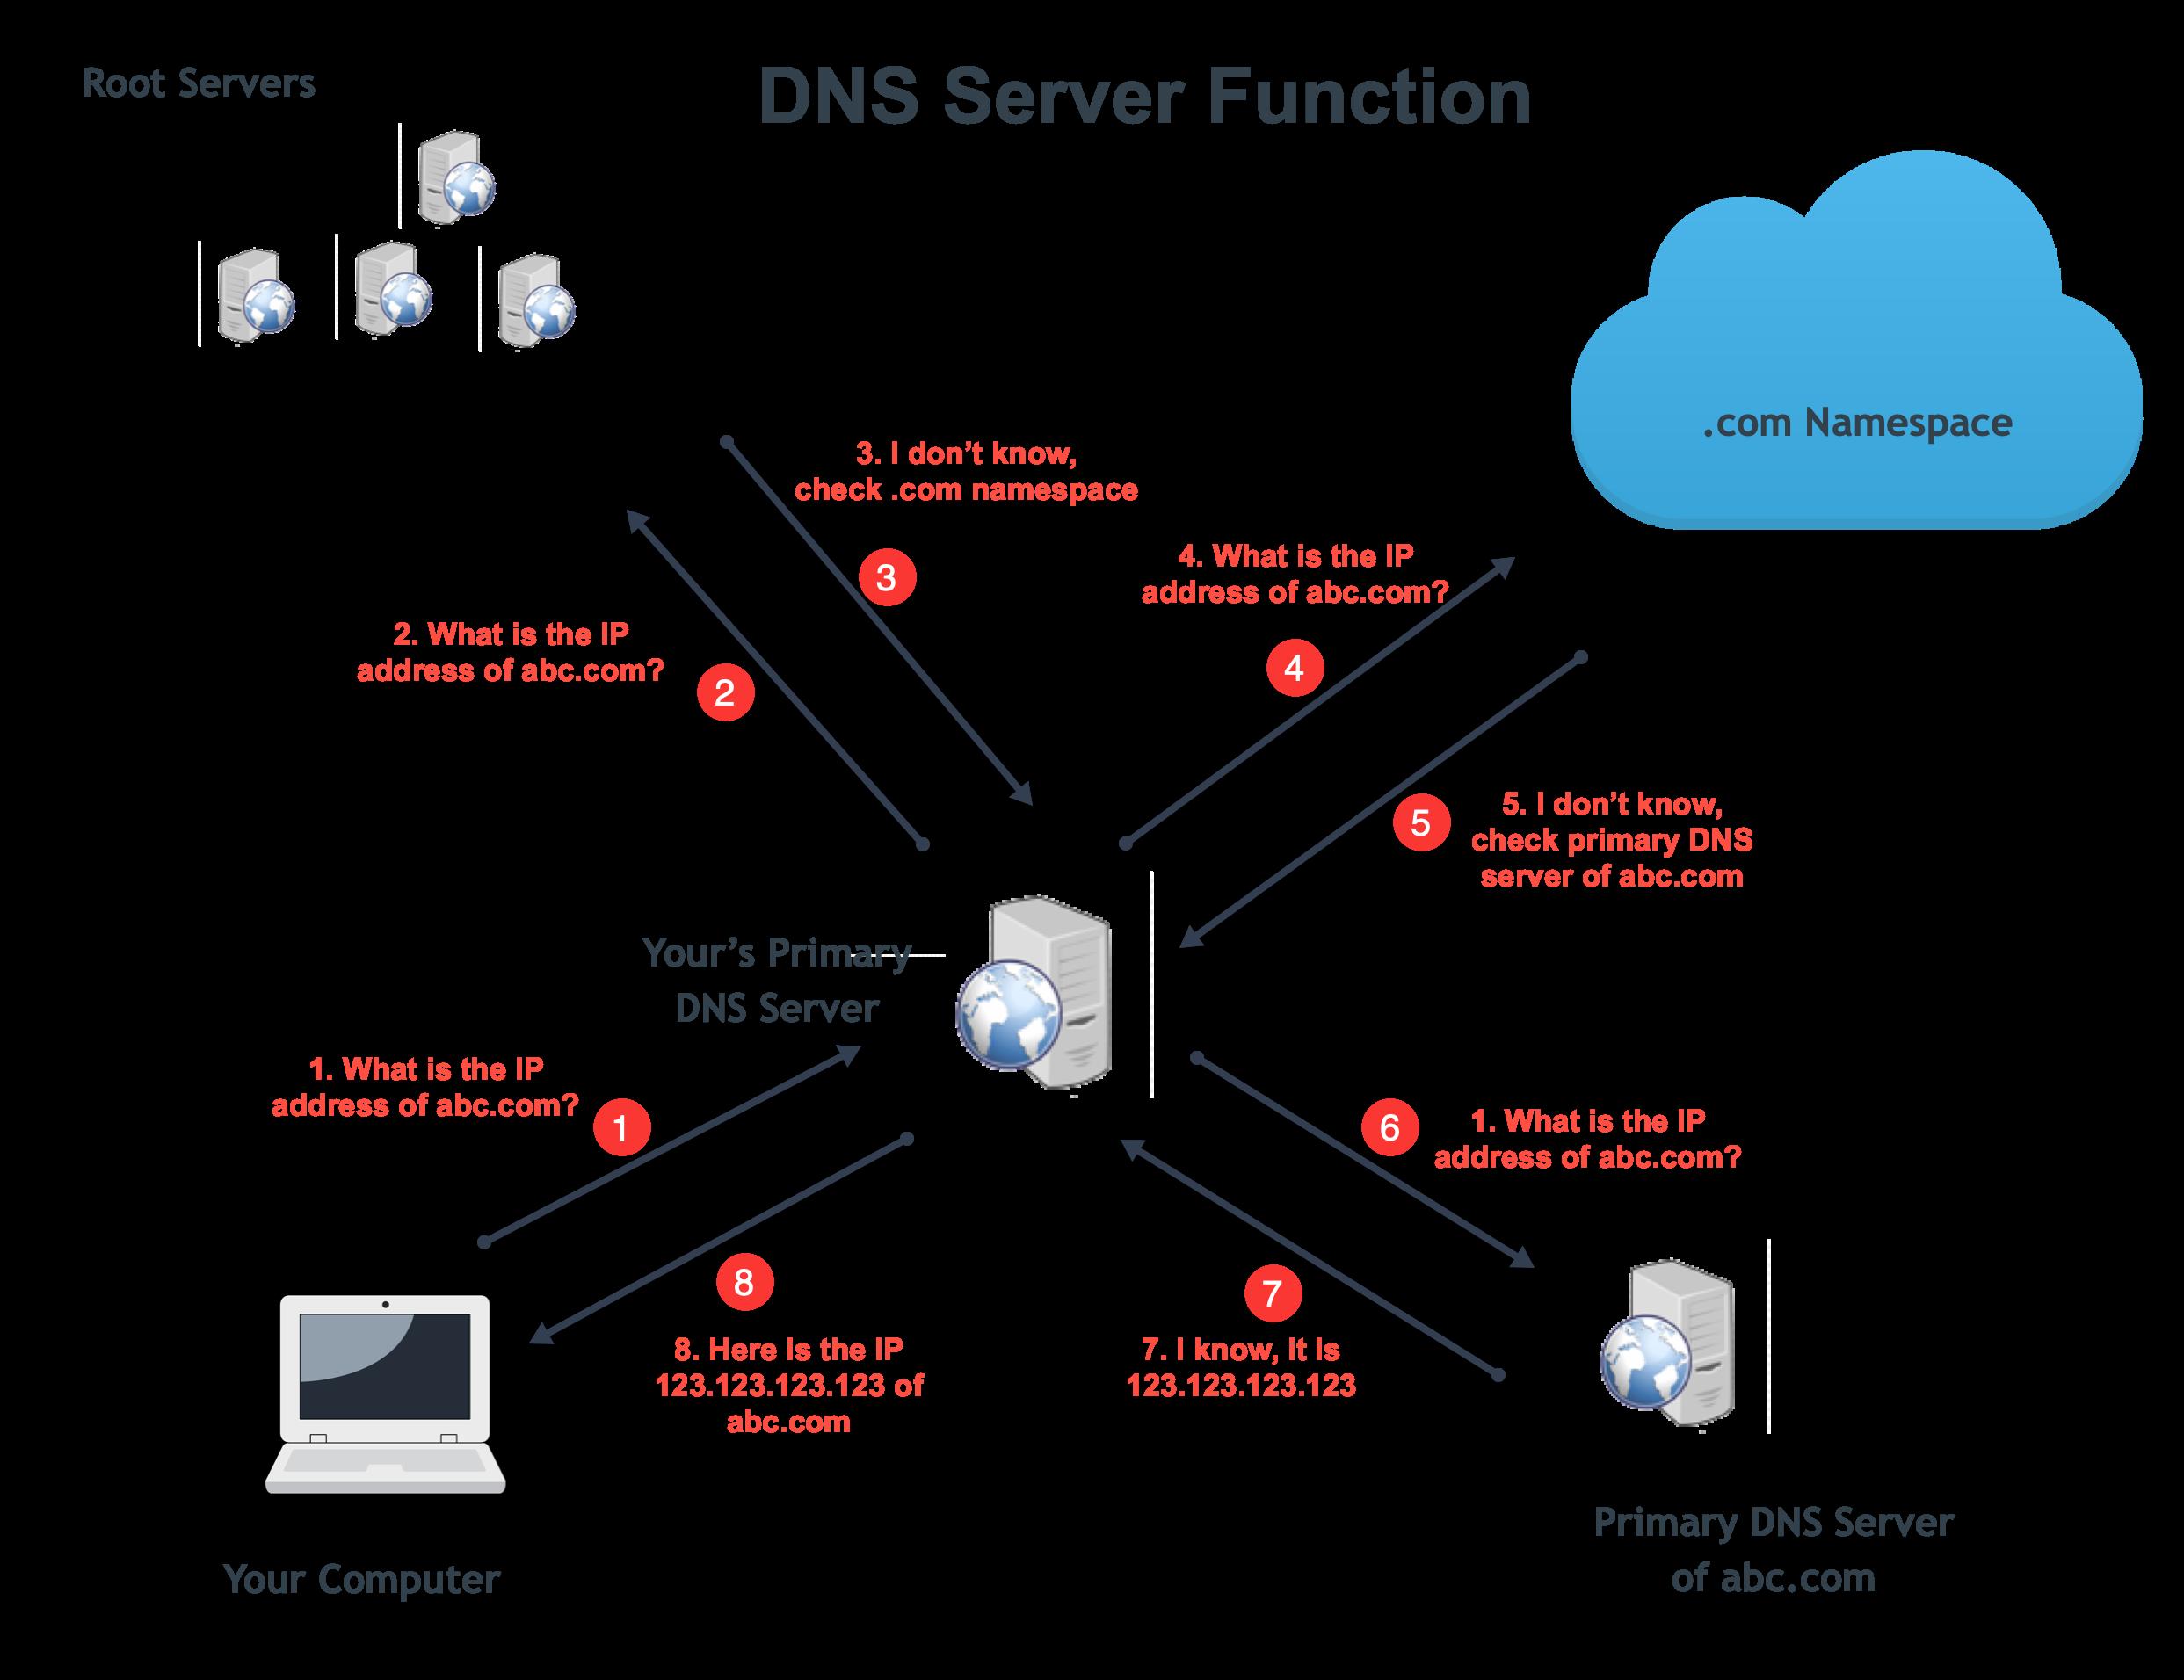 DNS Server Function